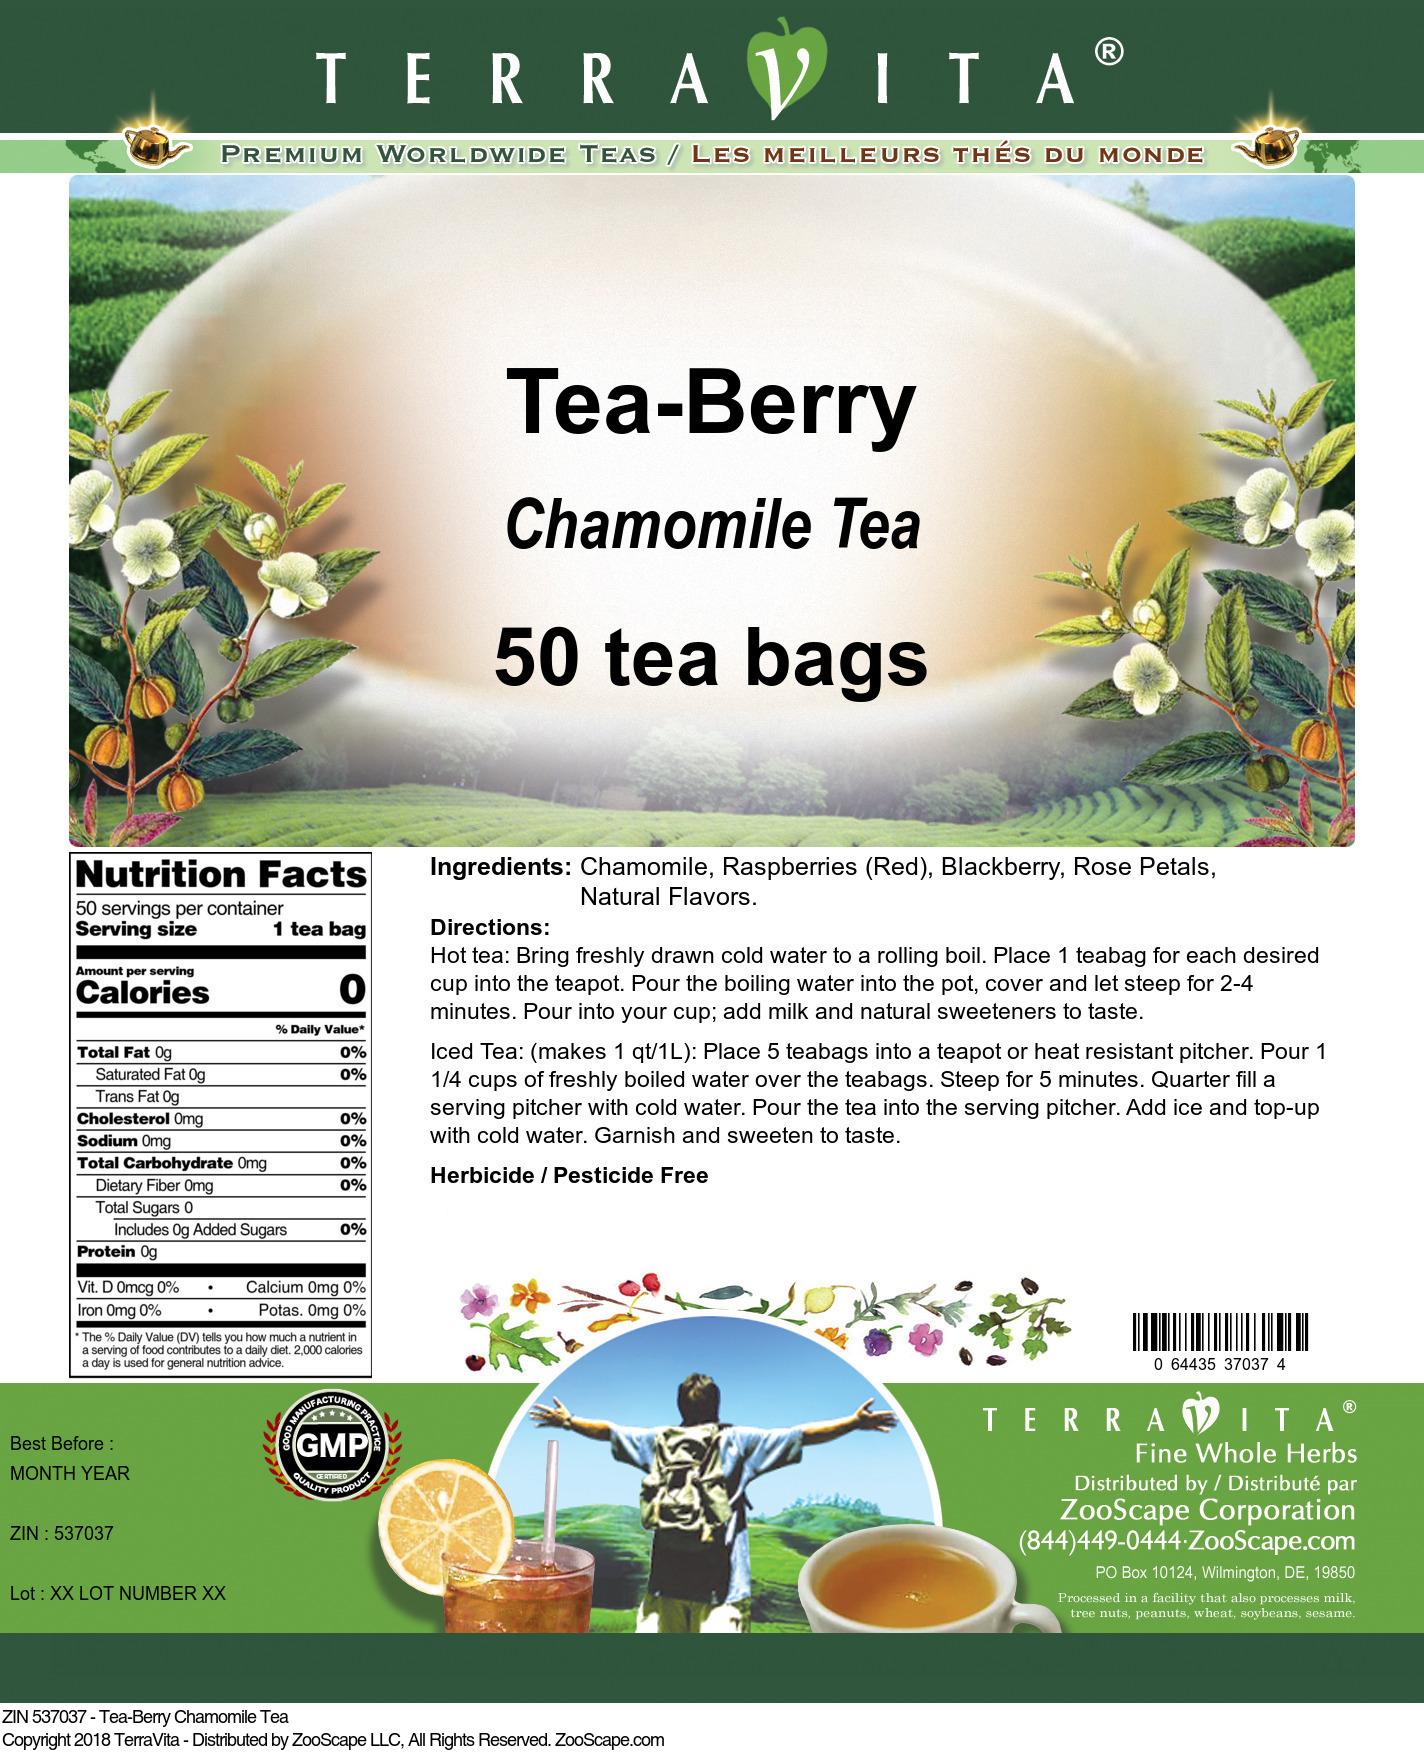 Tea-Berry Chamomile Tea